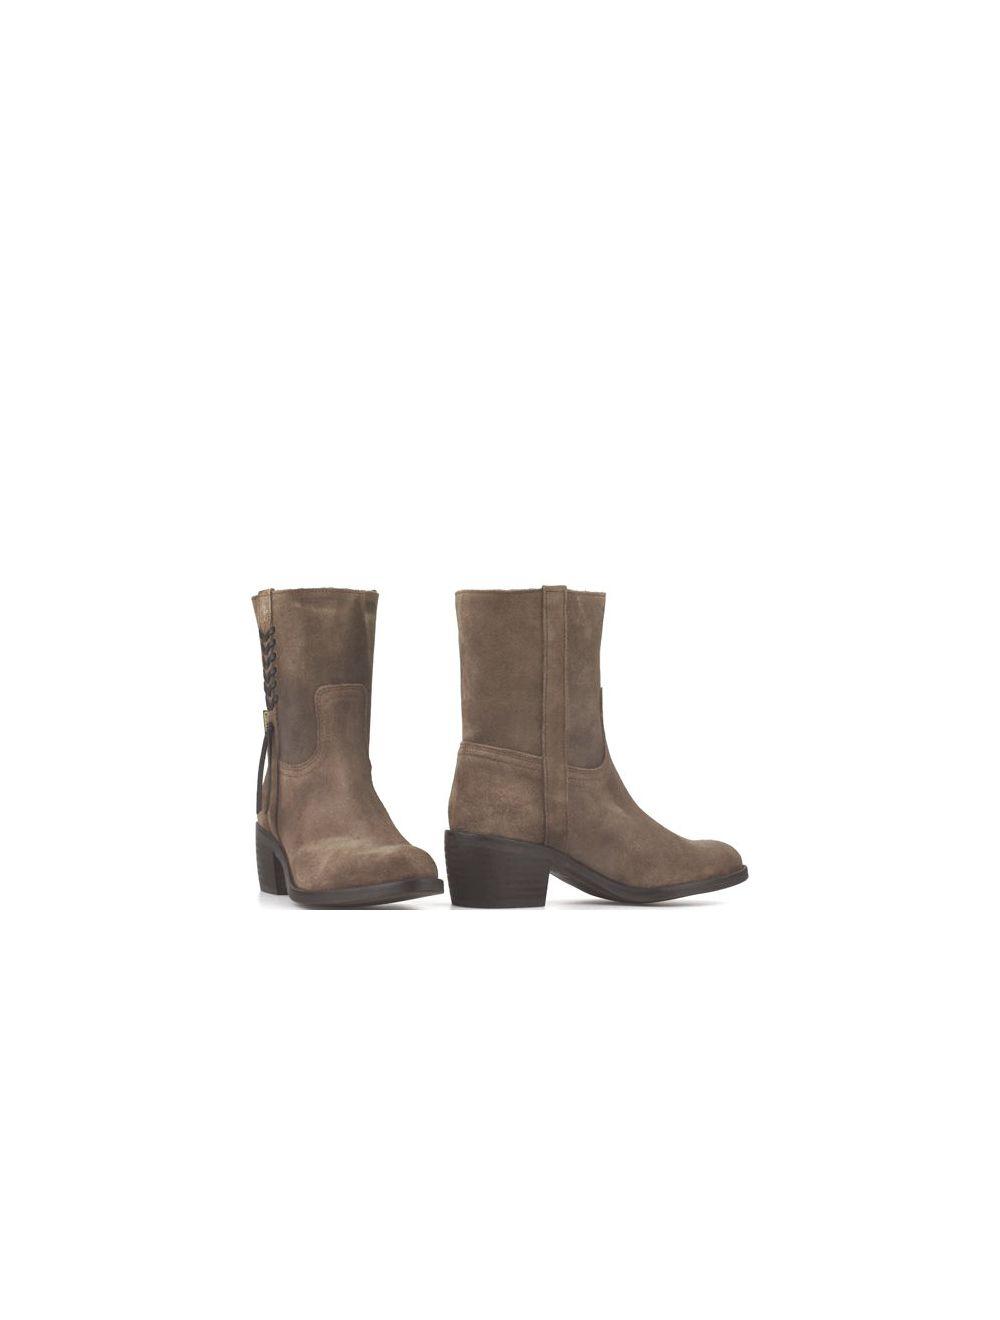 Dakota Boots 432 dames enkellaarsjes taupe suède